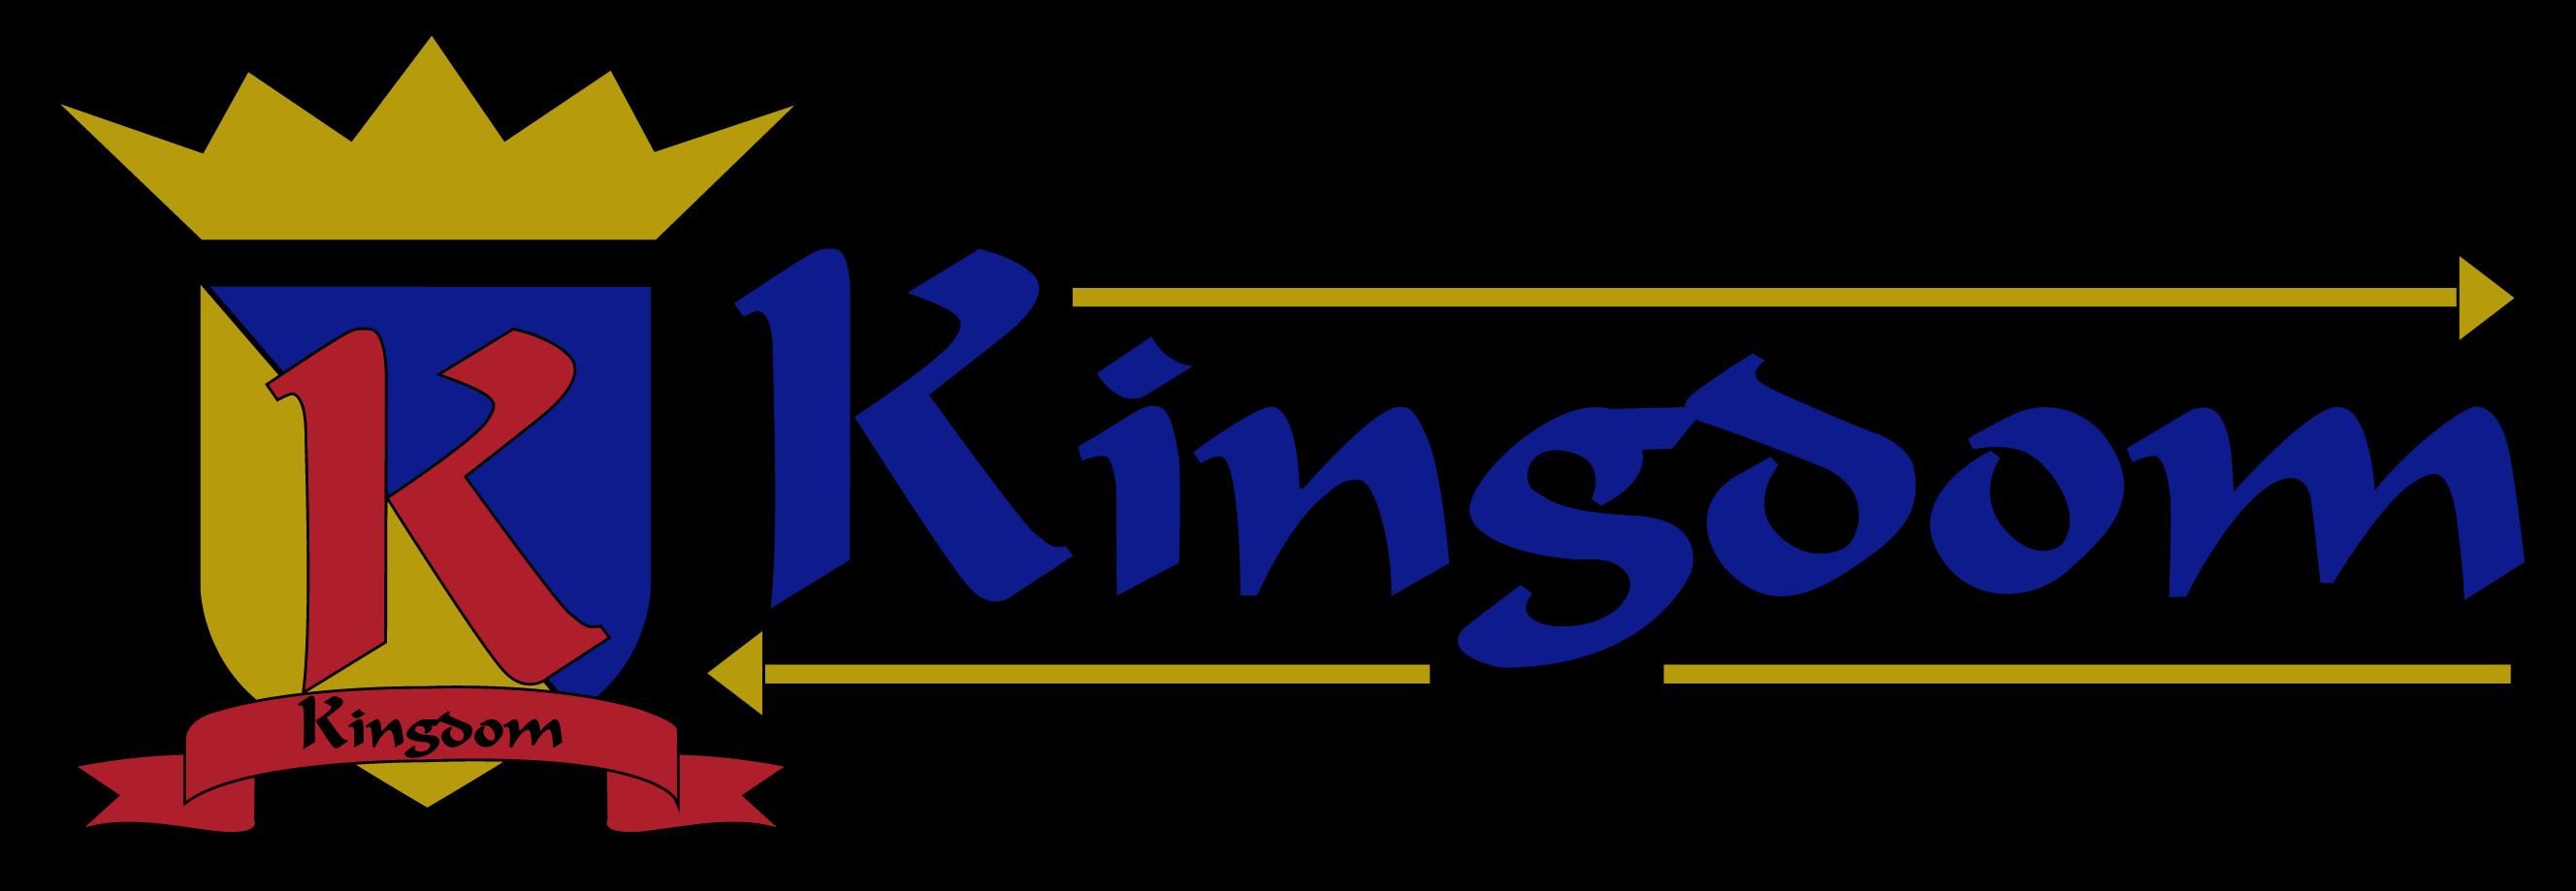 kingdomlogo.png